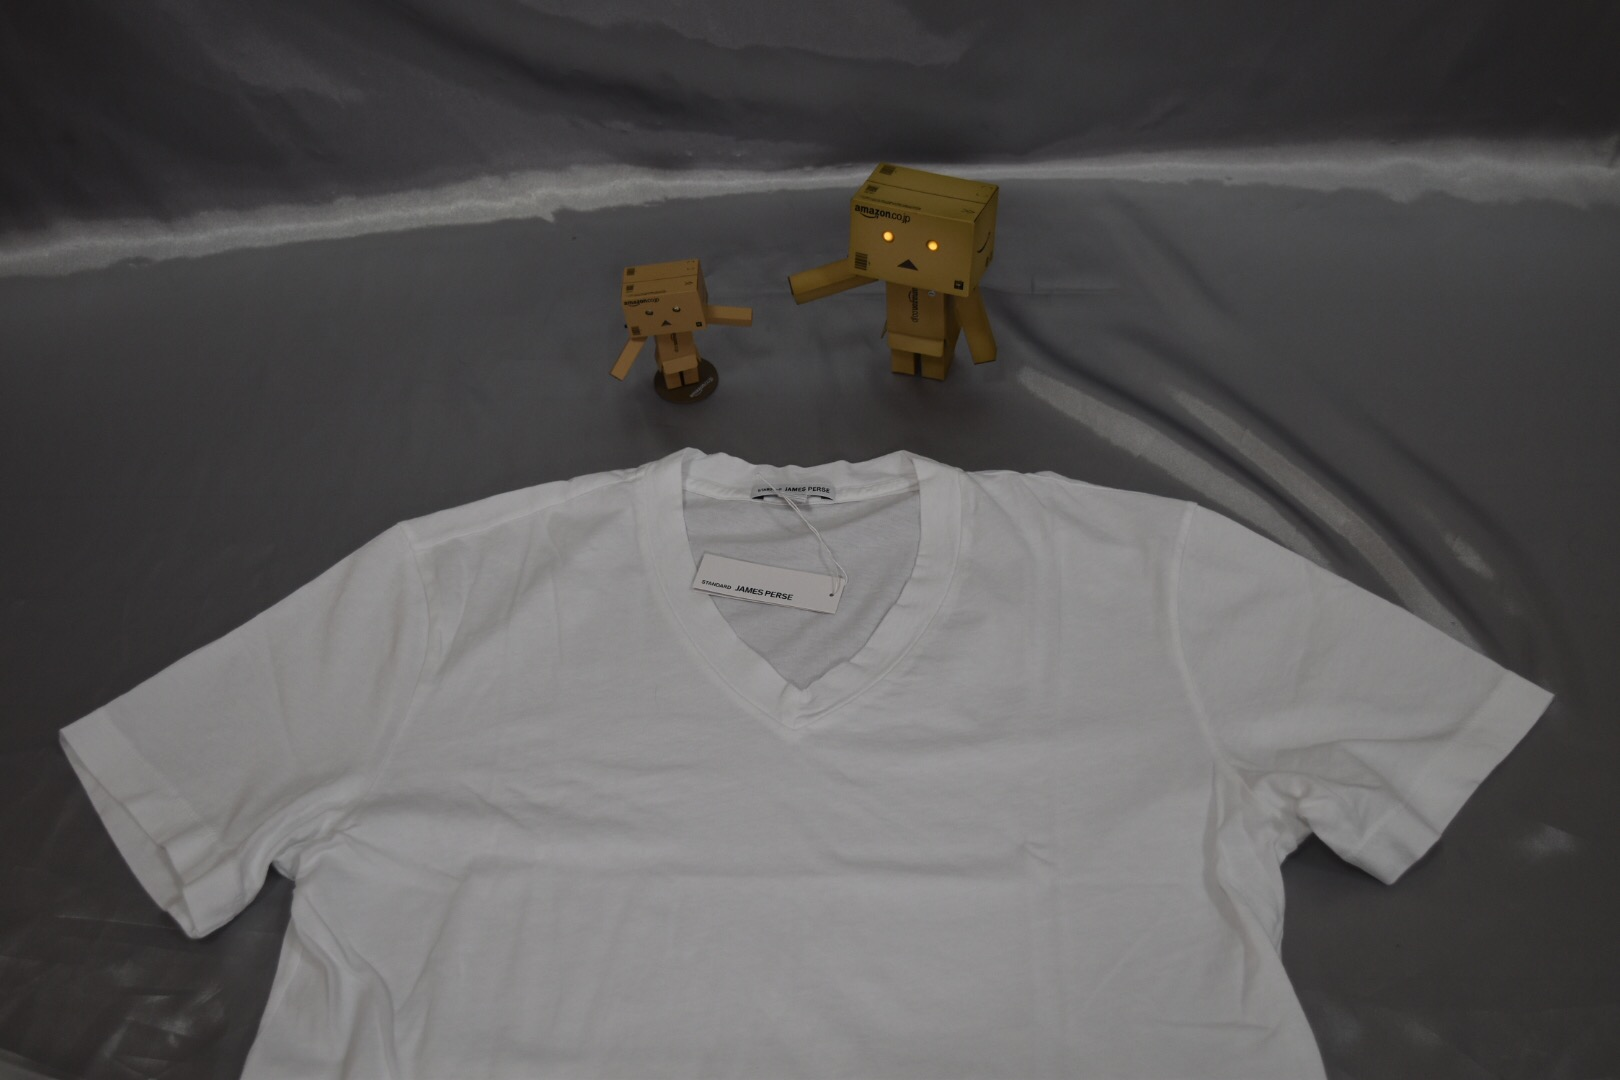 #129 GAP / JAMES PERSE / three dots / UA のTシャツを比較してみた